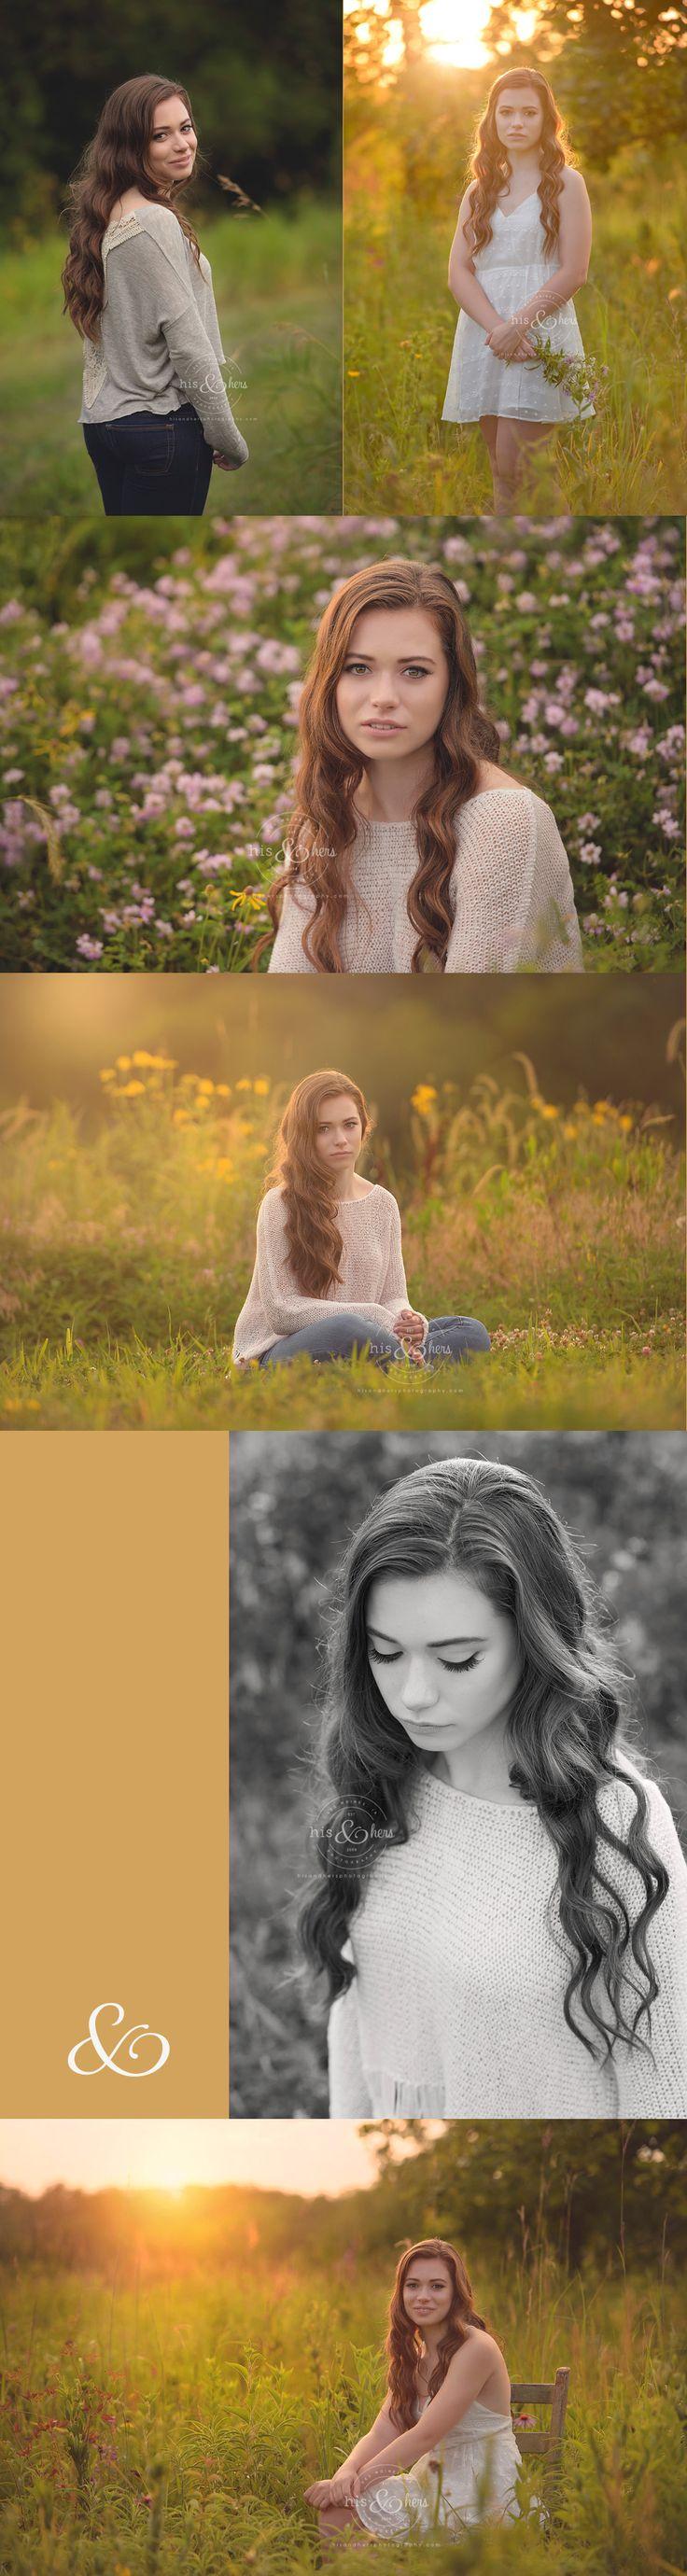 Des Moines, Iowa #seniorpictures #seniorportraits #classof2015 photographer, Randy Milder | His & Hers